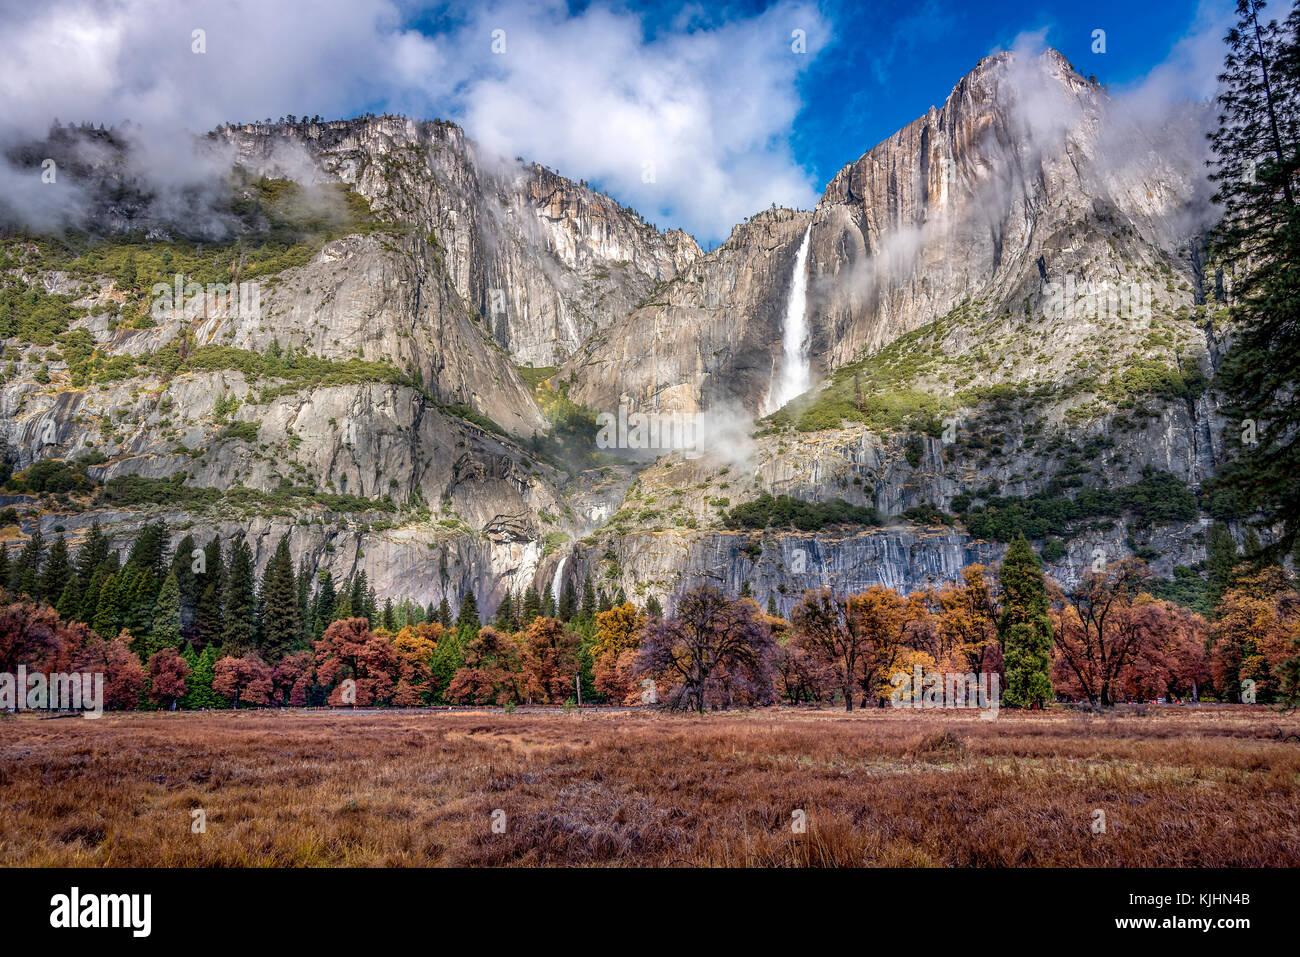 Landscape of Yosemite National Park, California - Stock Image